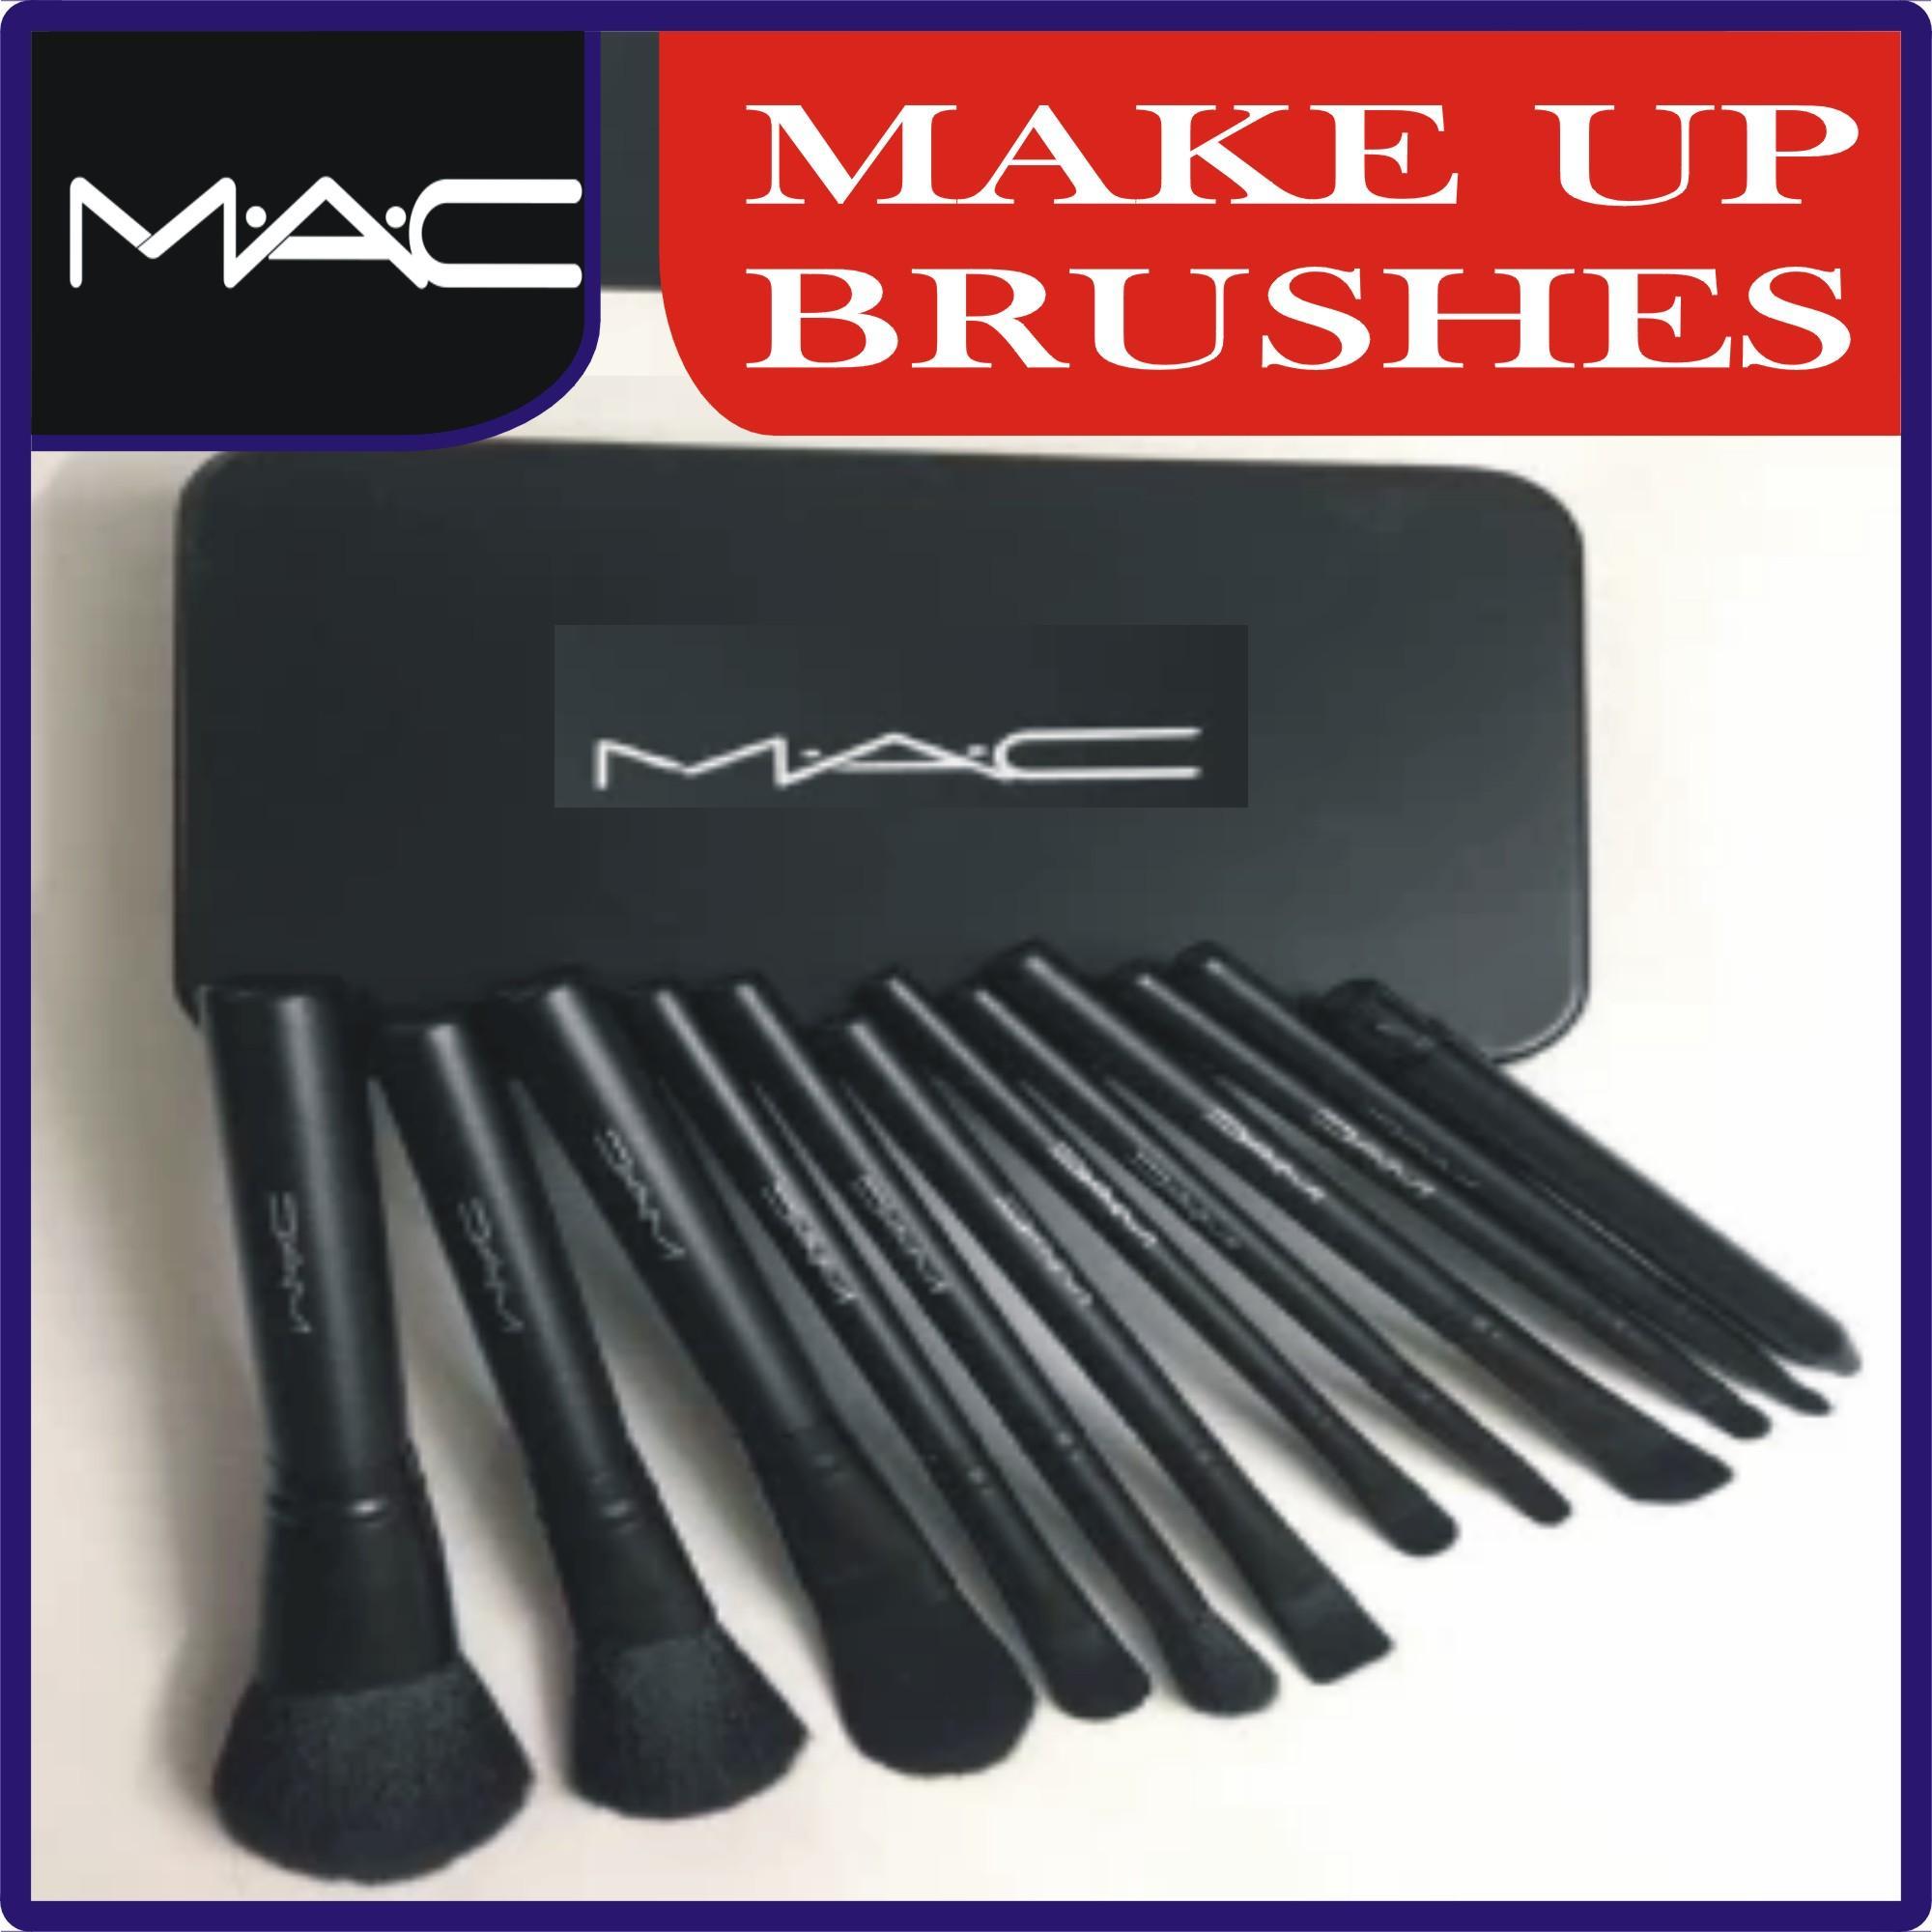 M.A.C Makeup Brush Set 12 Pcs Set in Steel Box: Buy Online at Best Prices in Pakistan | Daraz.pk